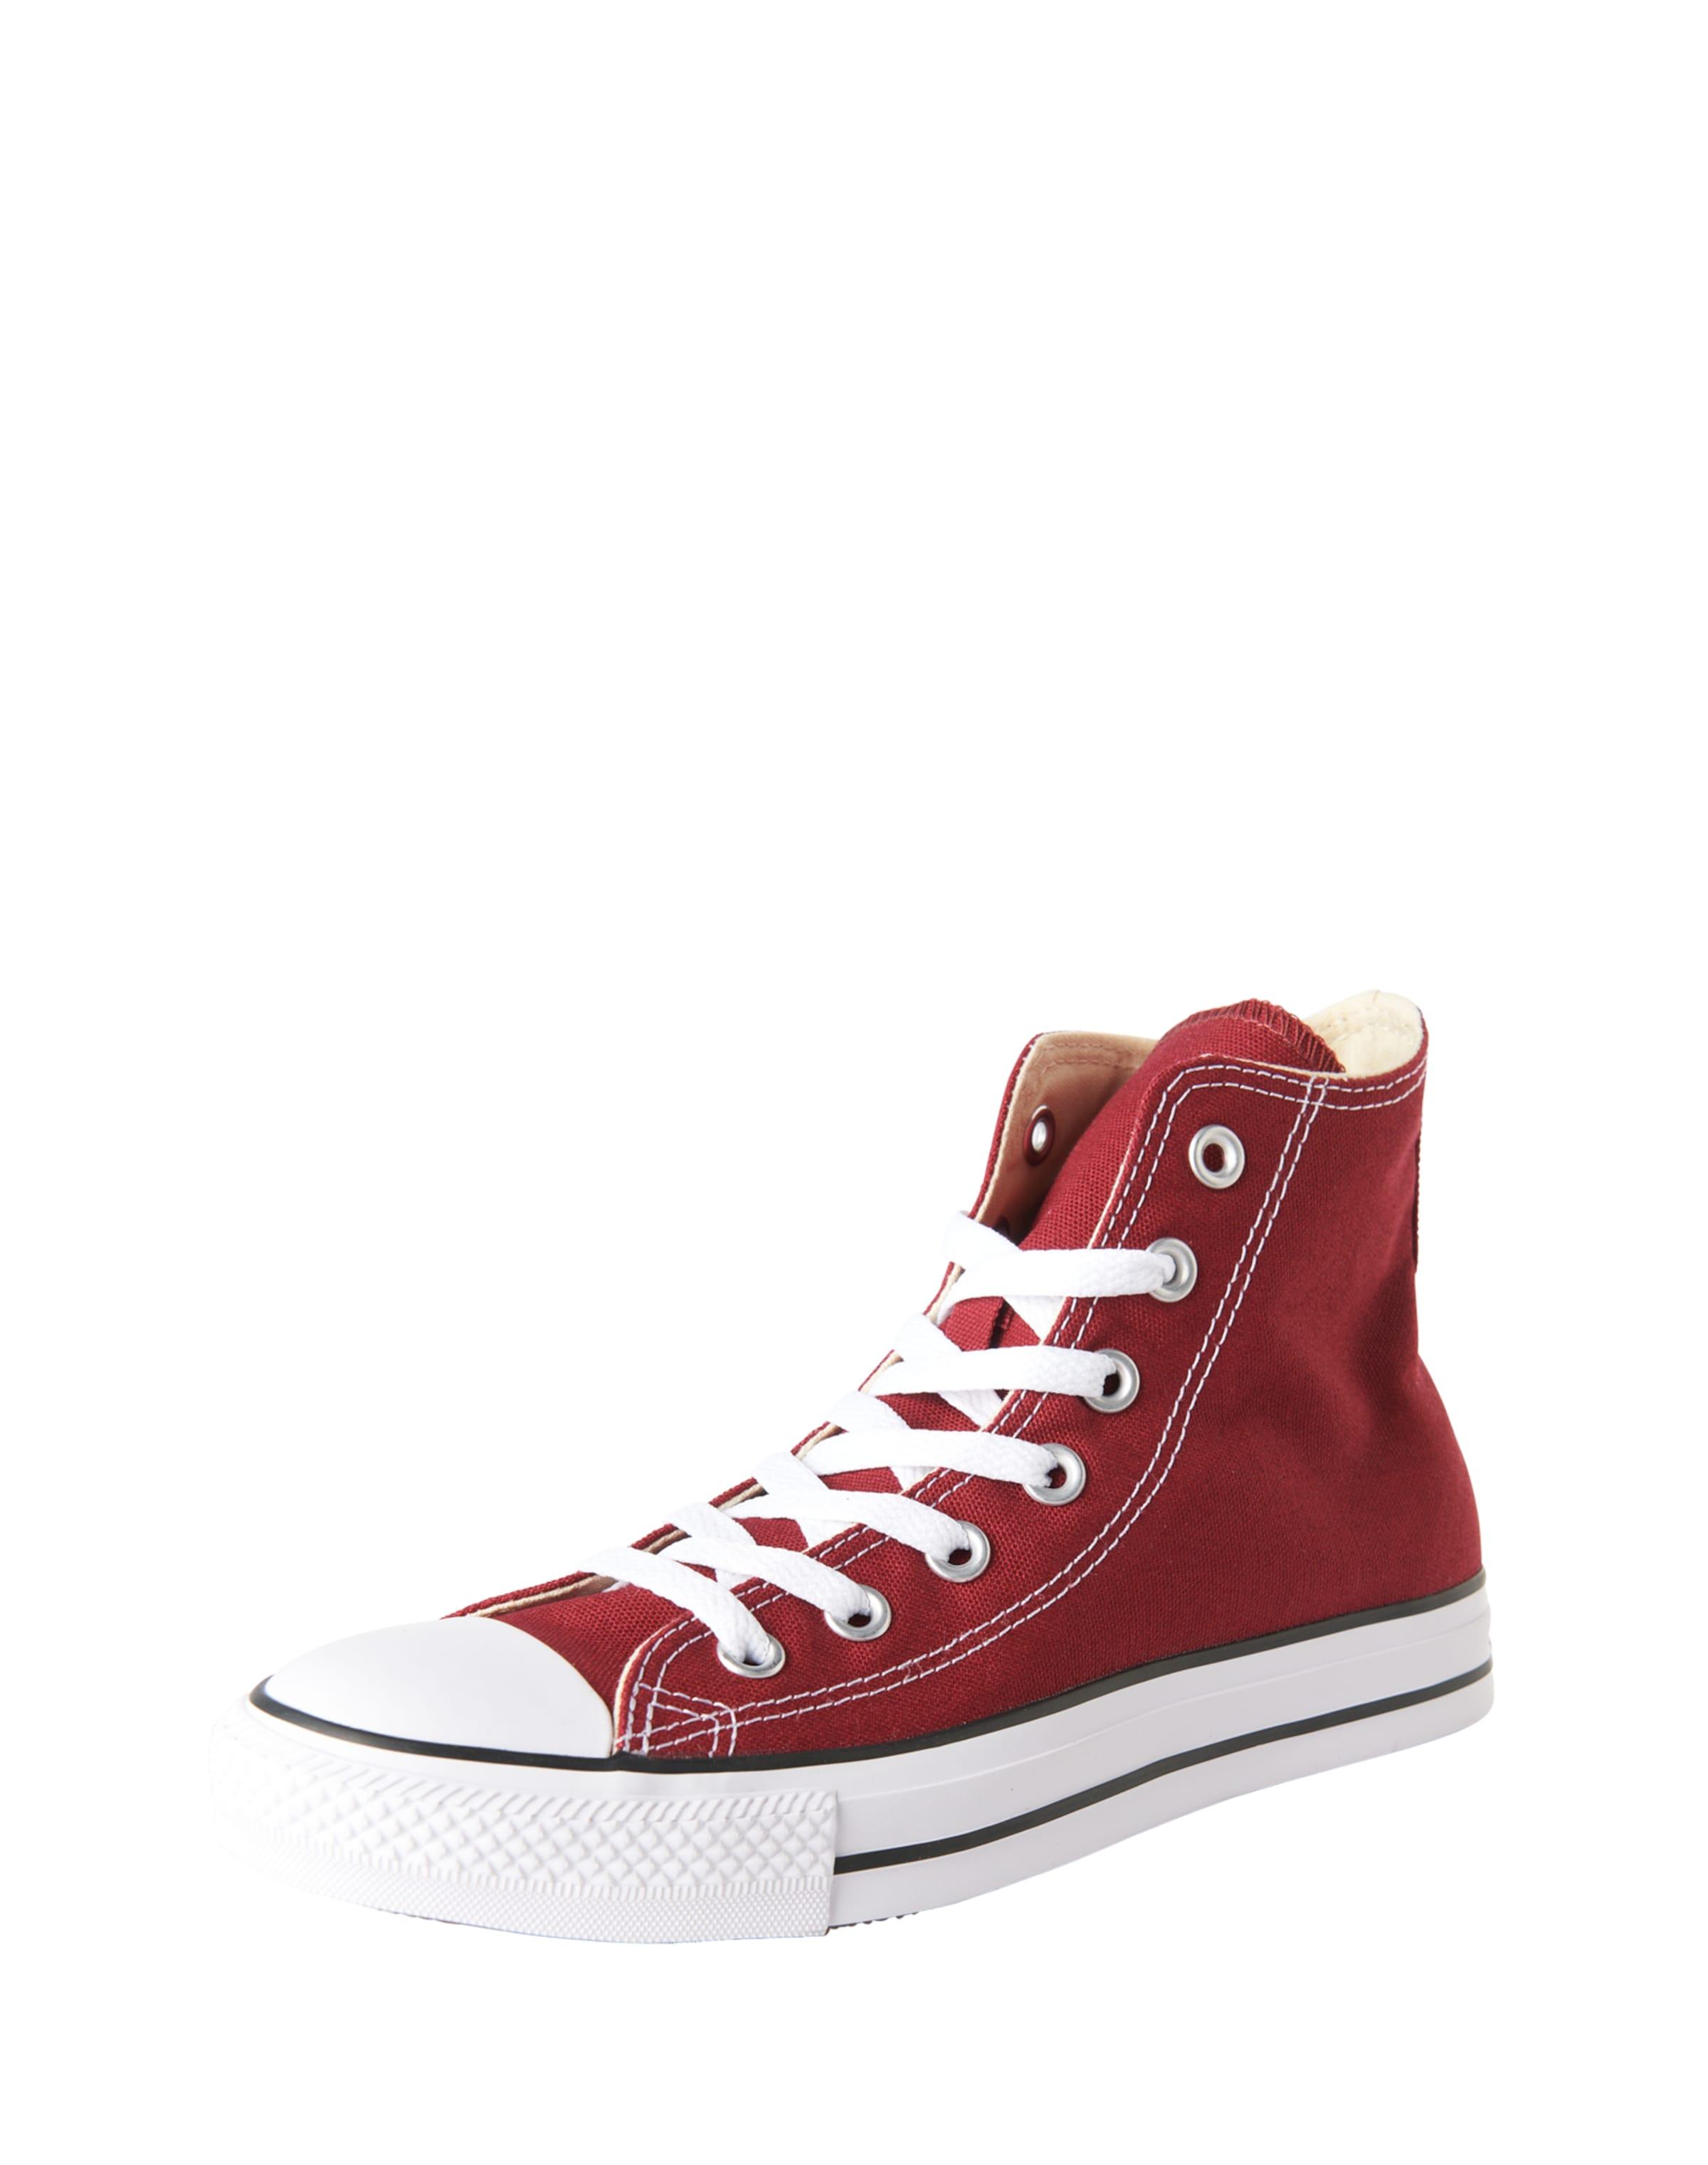 CONVERSE Sneaker High Verschleißfeste billige Schuhe